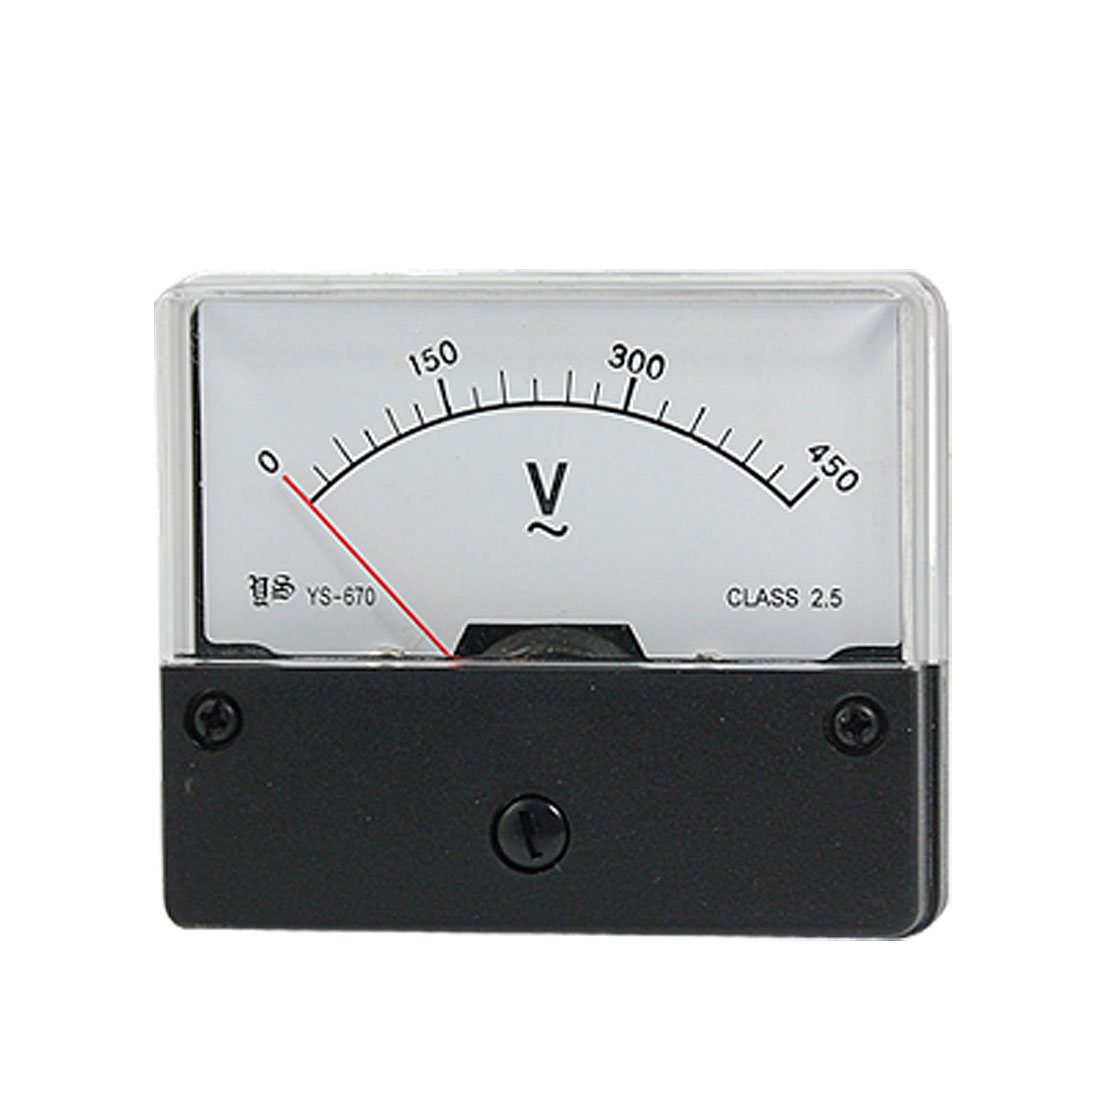 AC 0-450V Fine Tuning Dial Analog Voltmeter Panel Meter YS-670